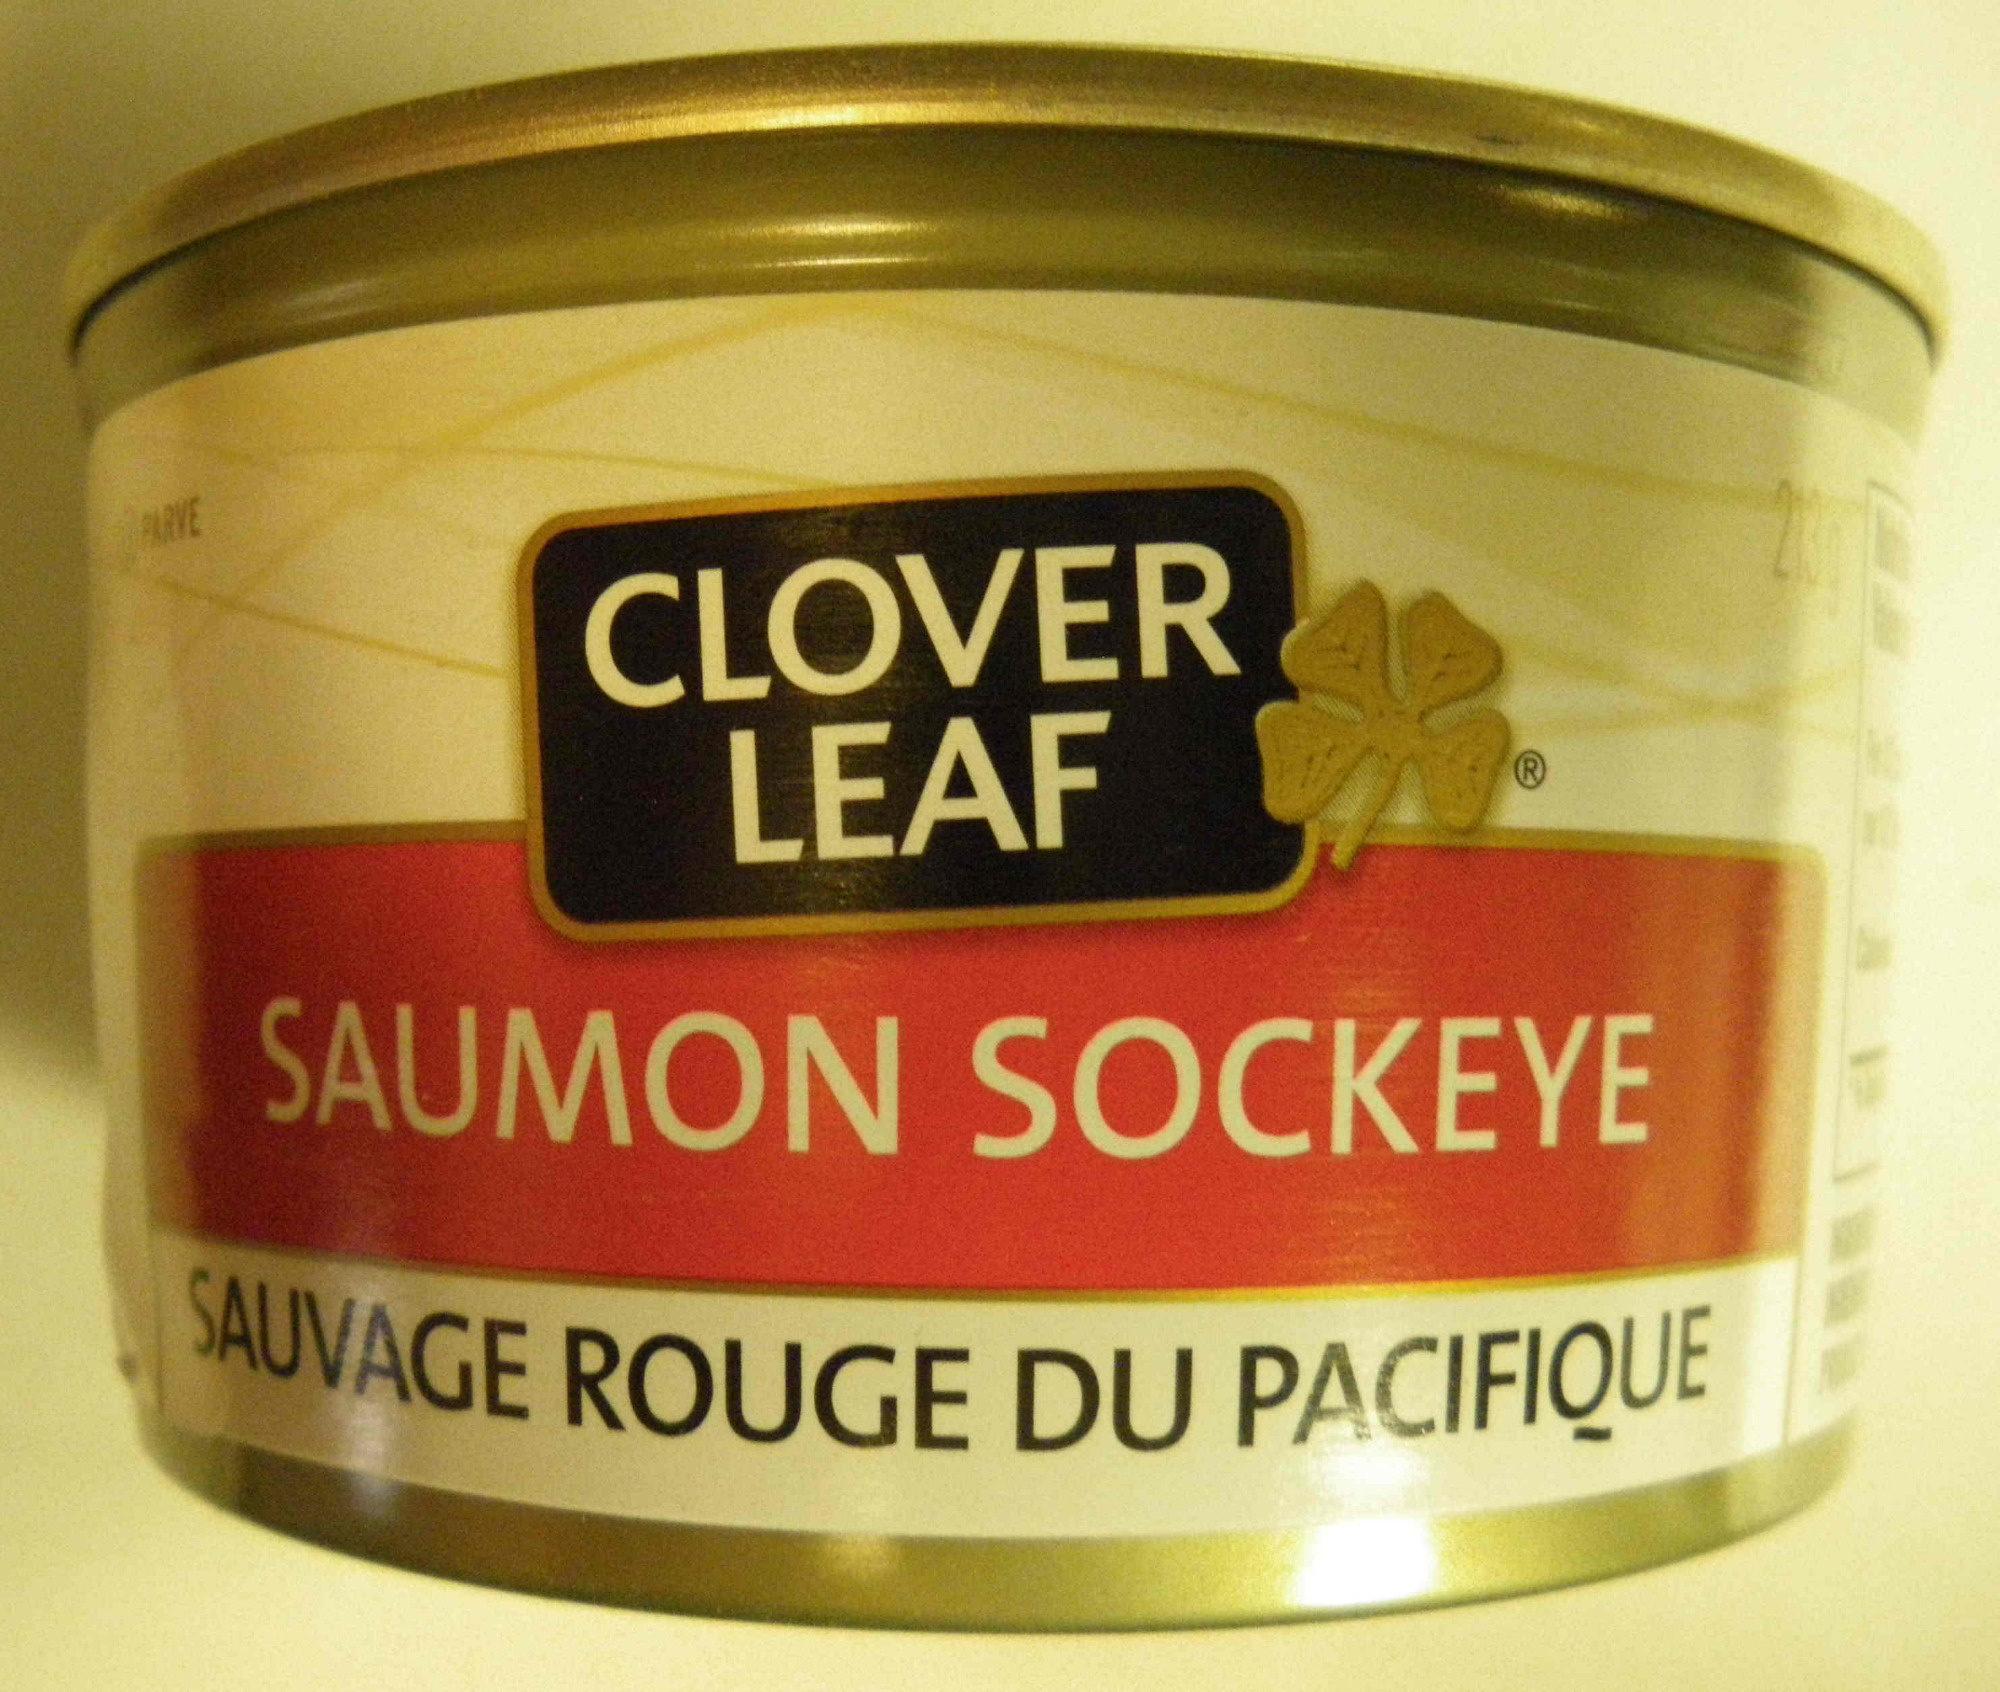 Saumon Sockeye - Product - en